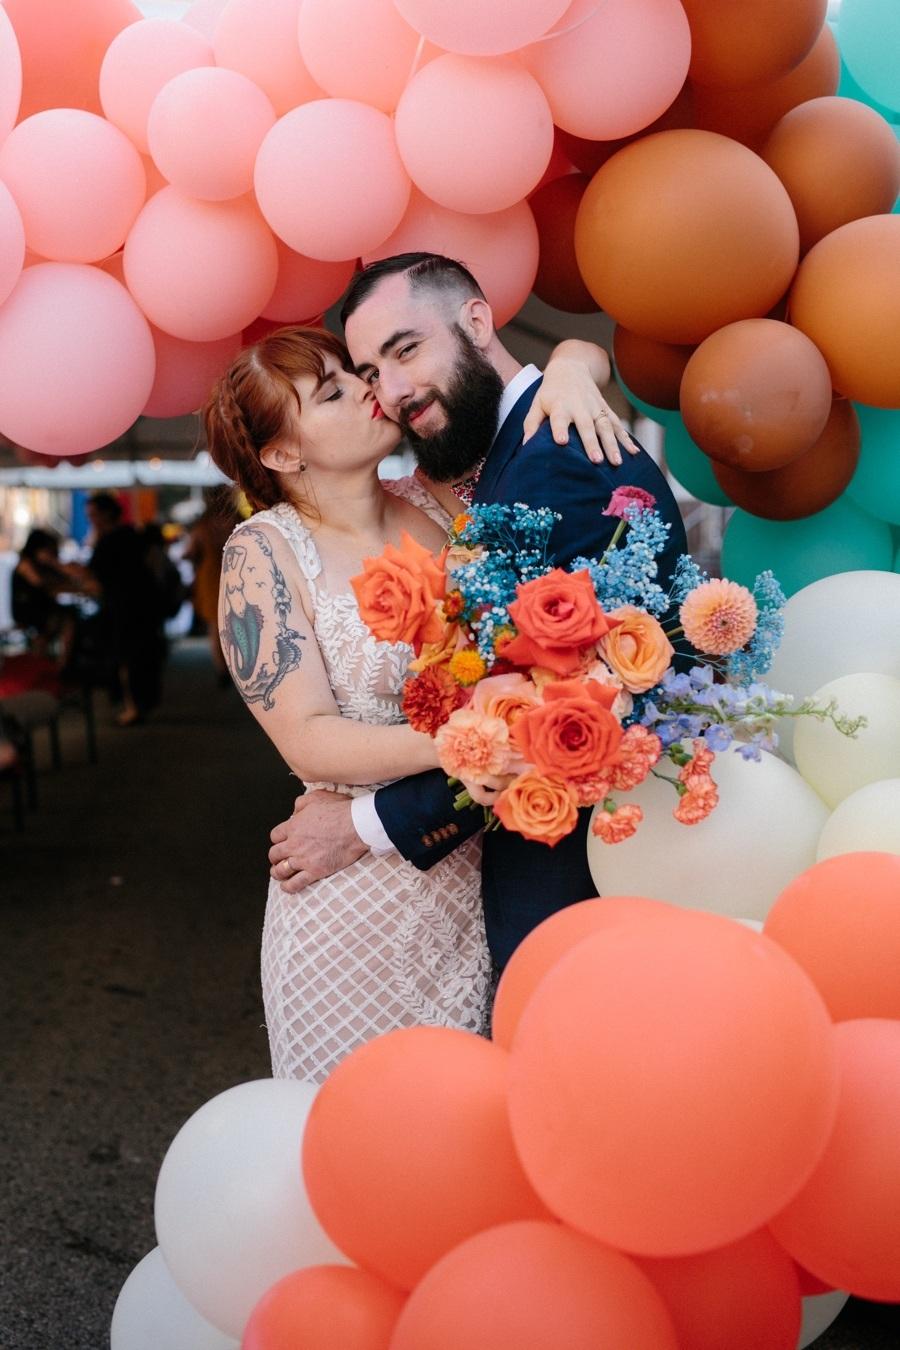 balloon wedding portrait